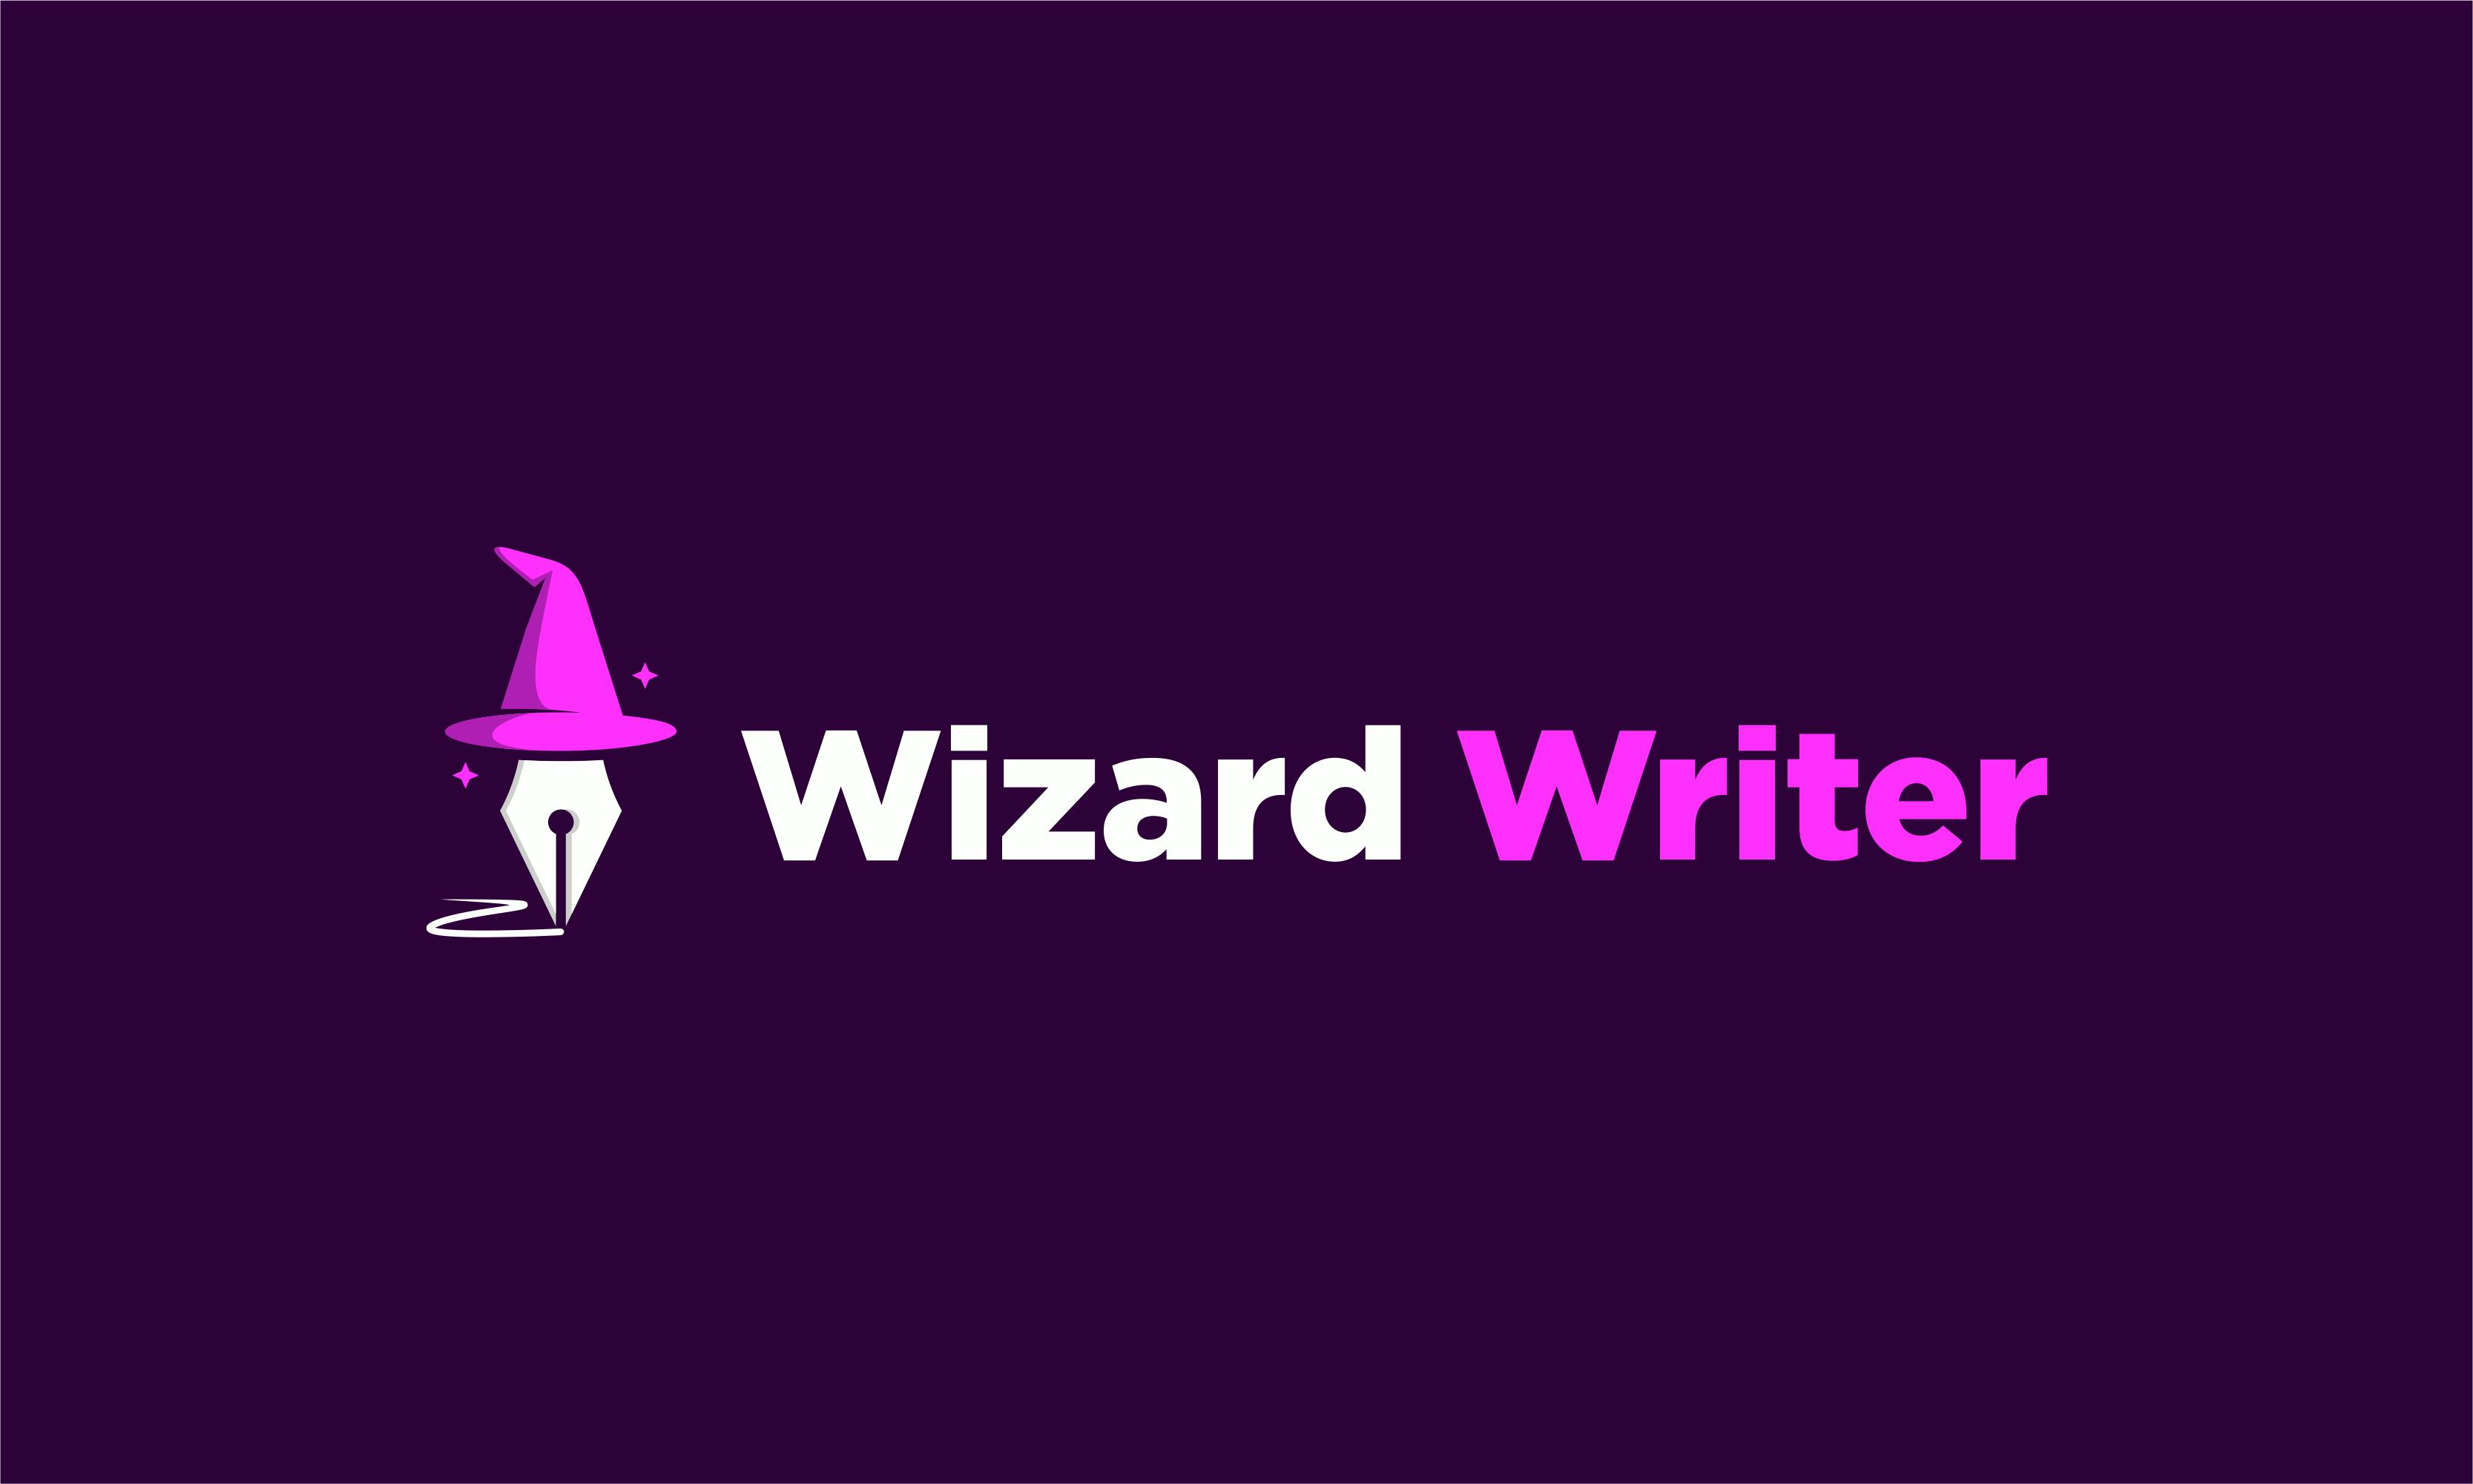 Wizardwriter